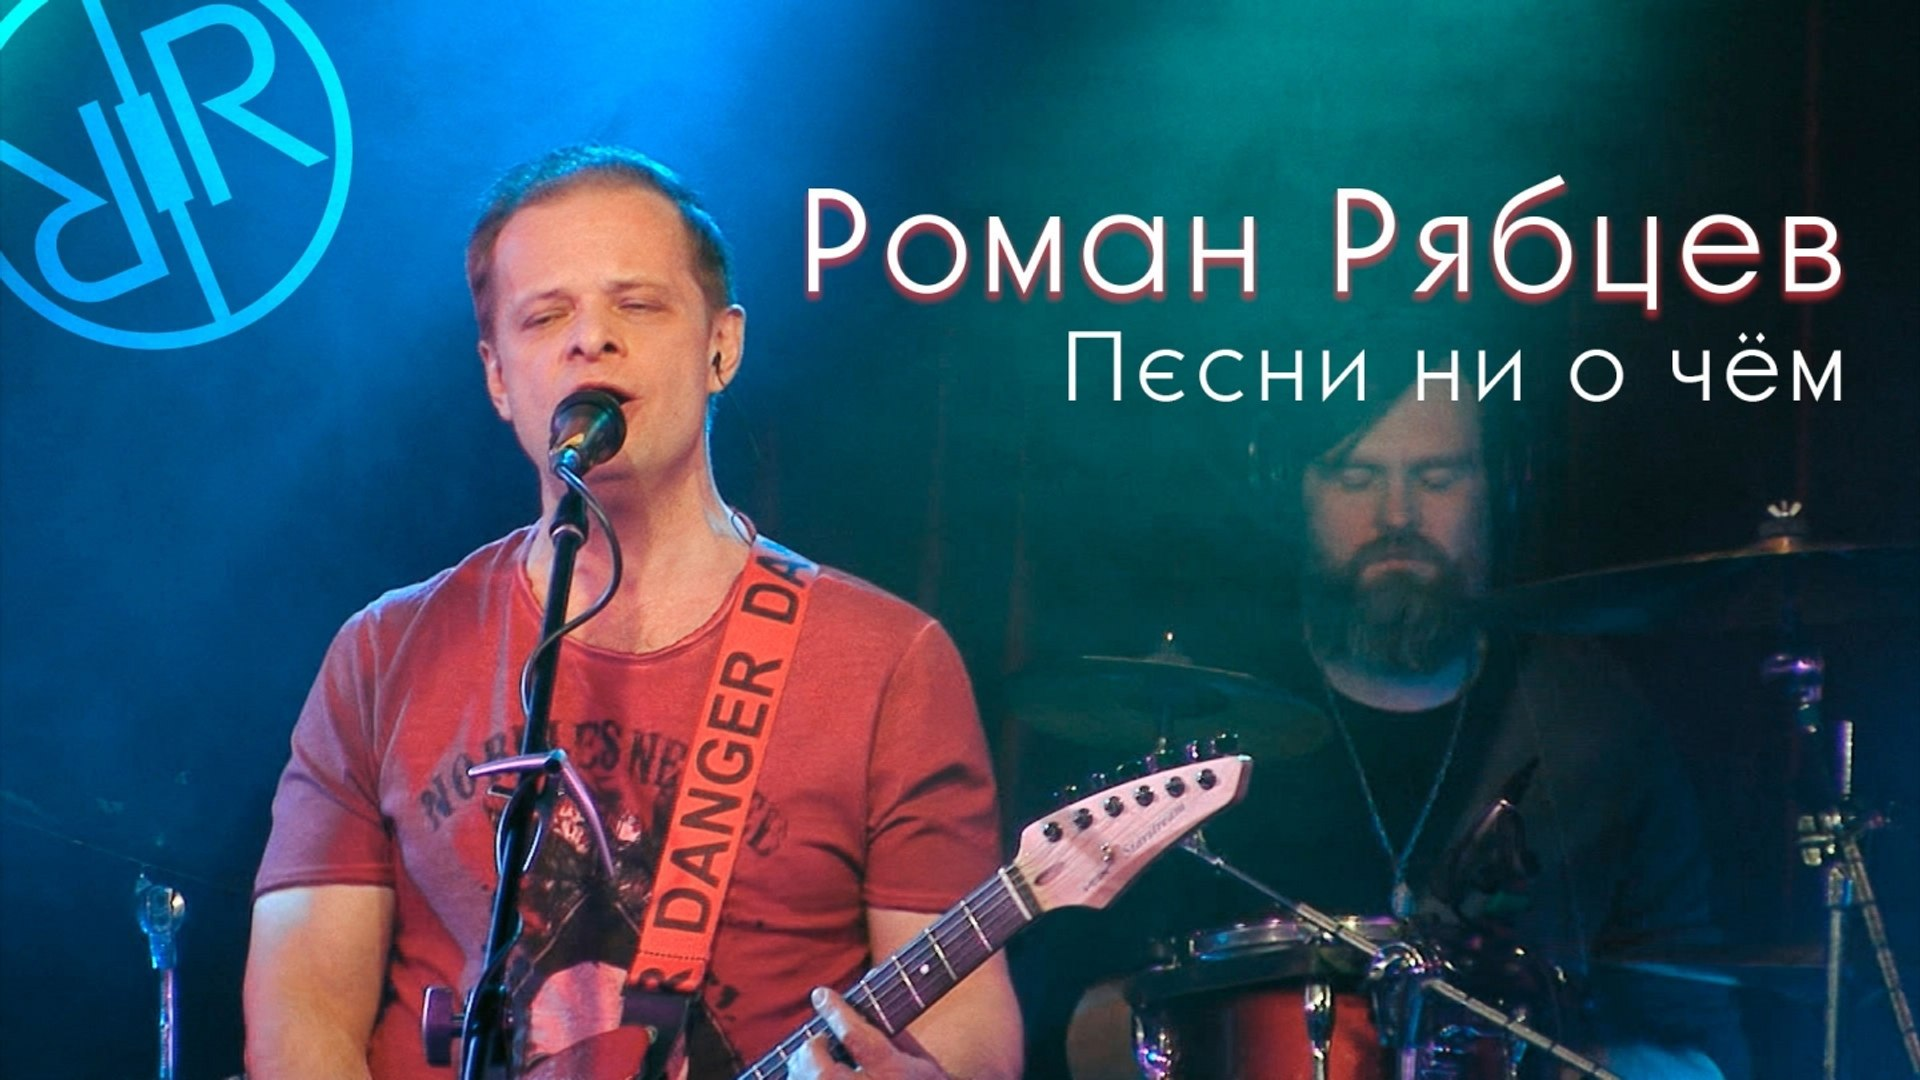 JV - Роман Рябцев - Песни ни о чём (Live)